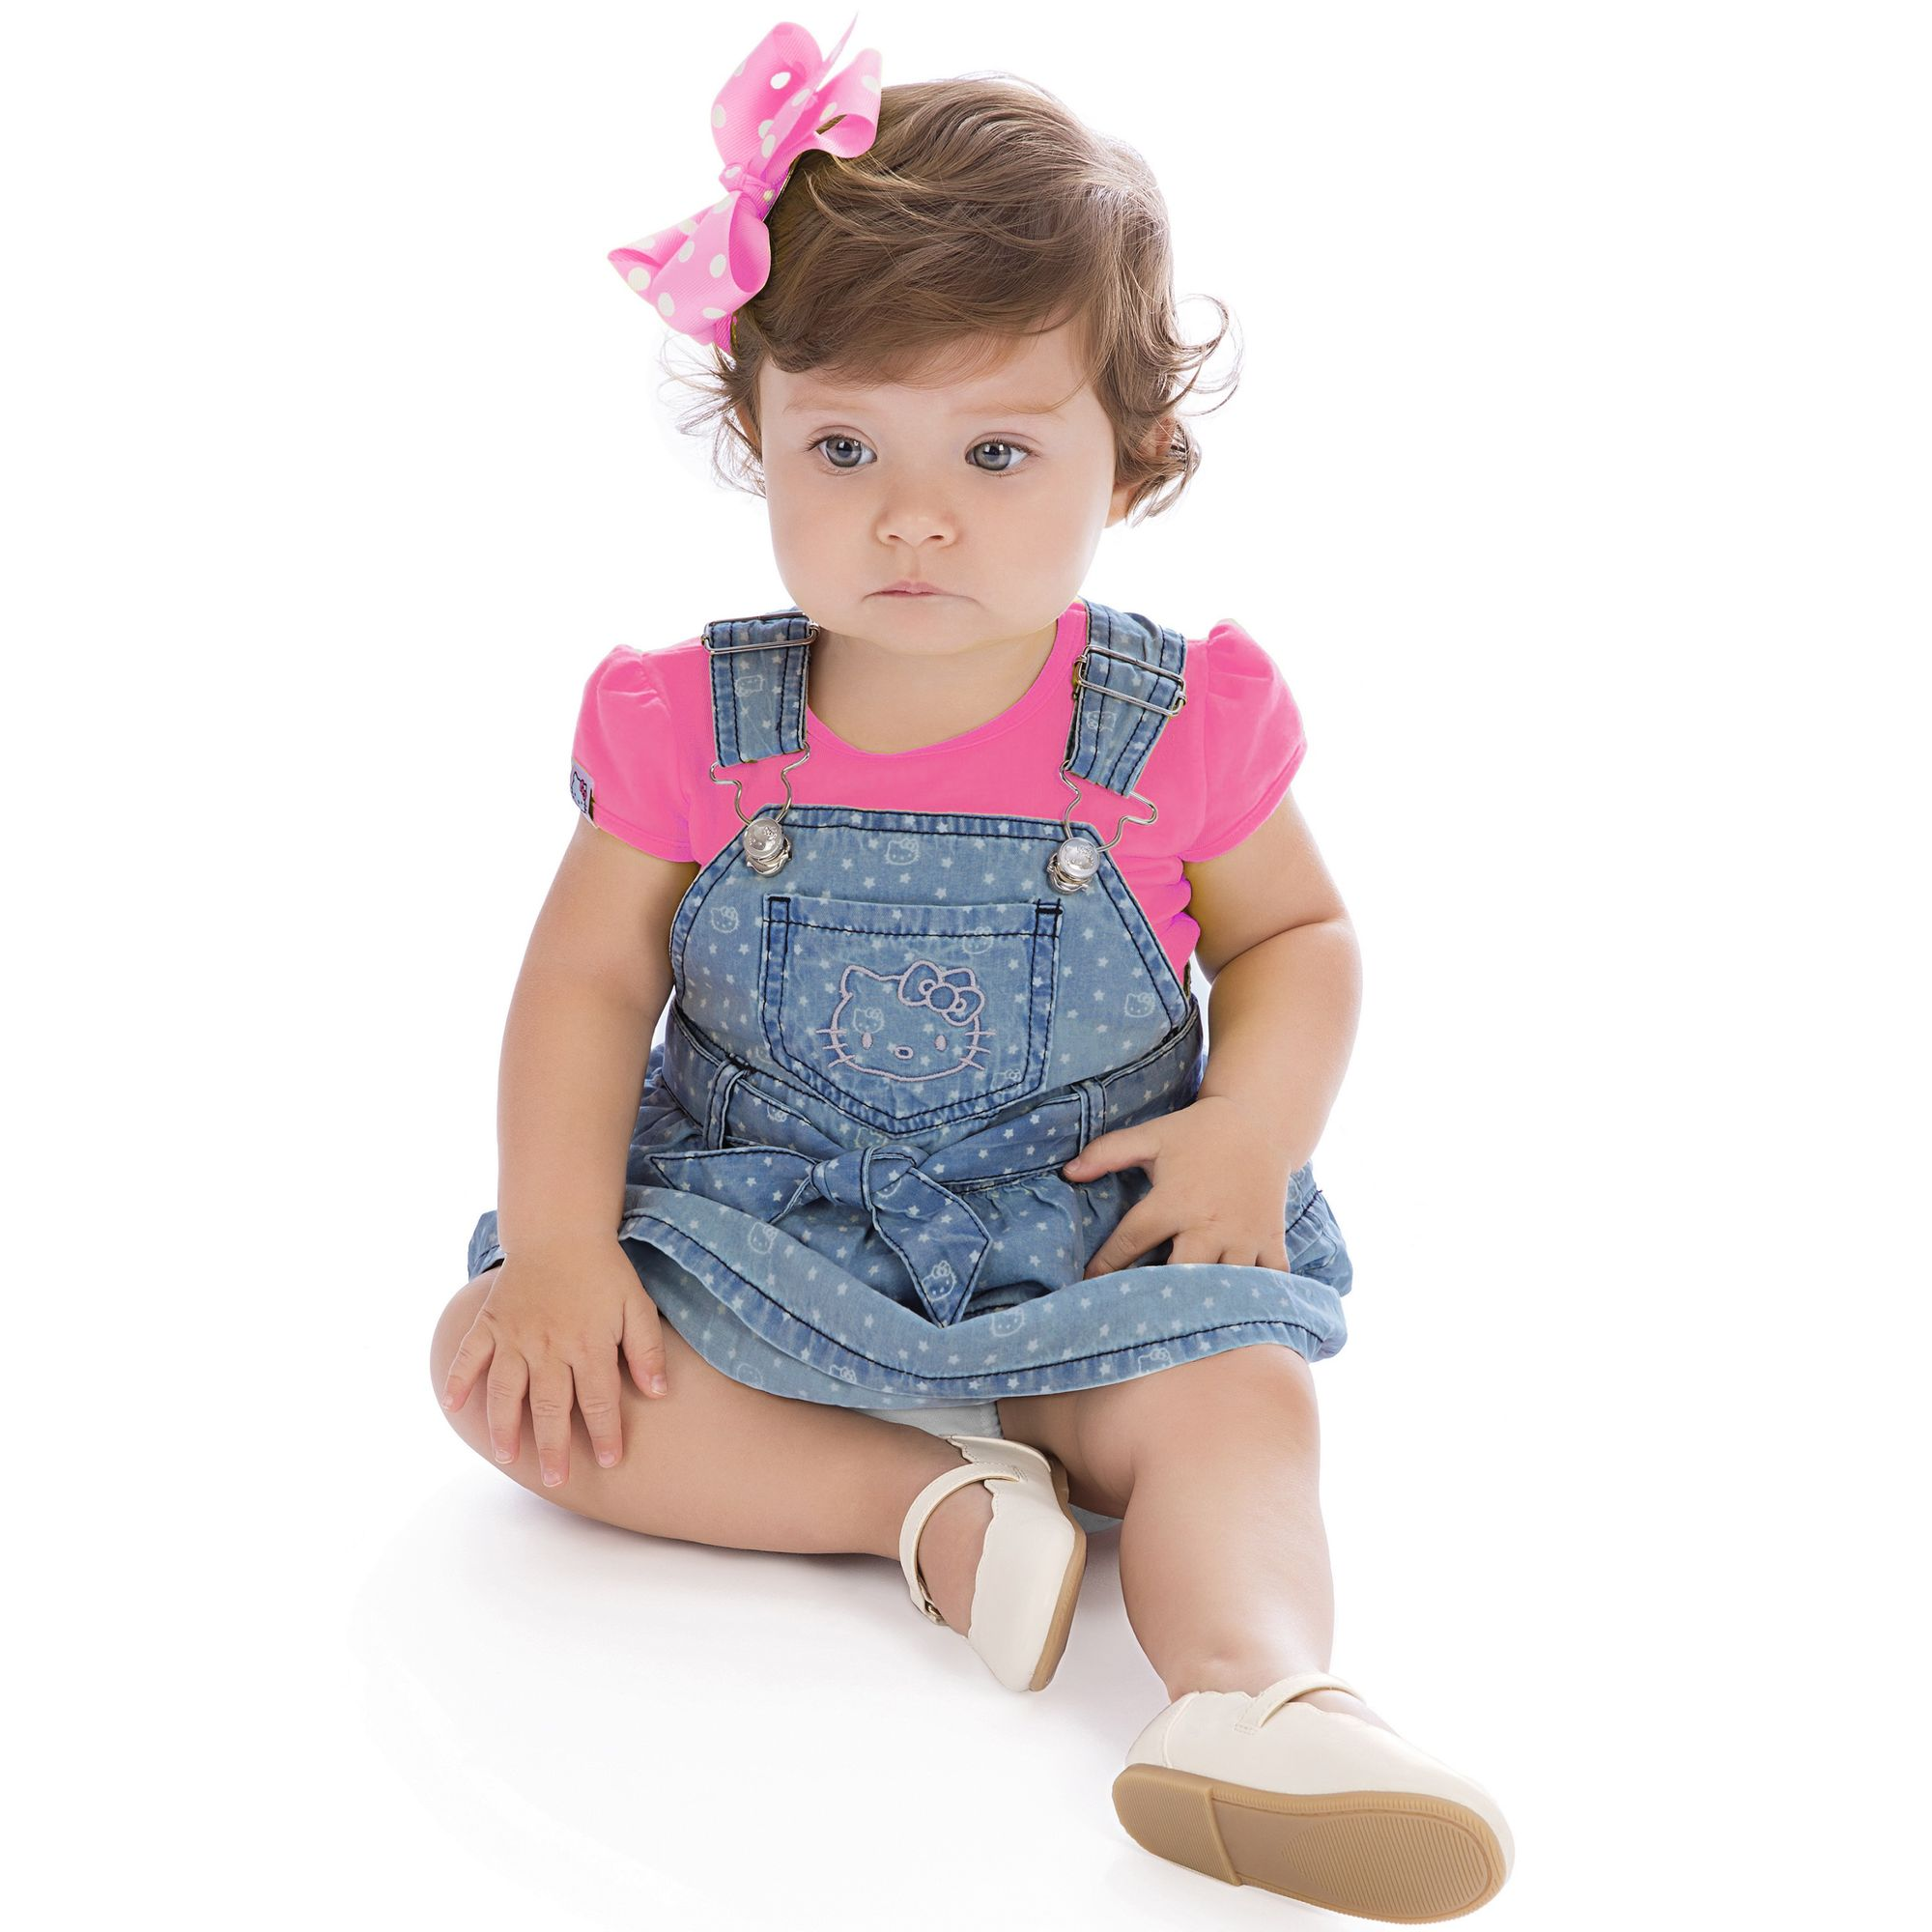 Jardineira jeans estrelas e camiseta pink hello kitty for Jardineira jeans infantil c a